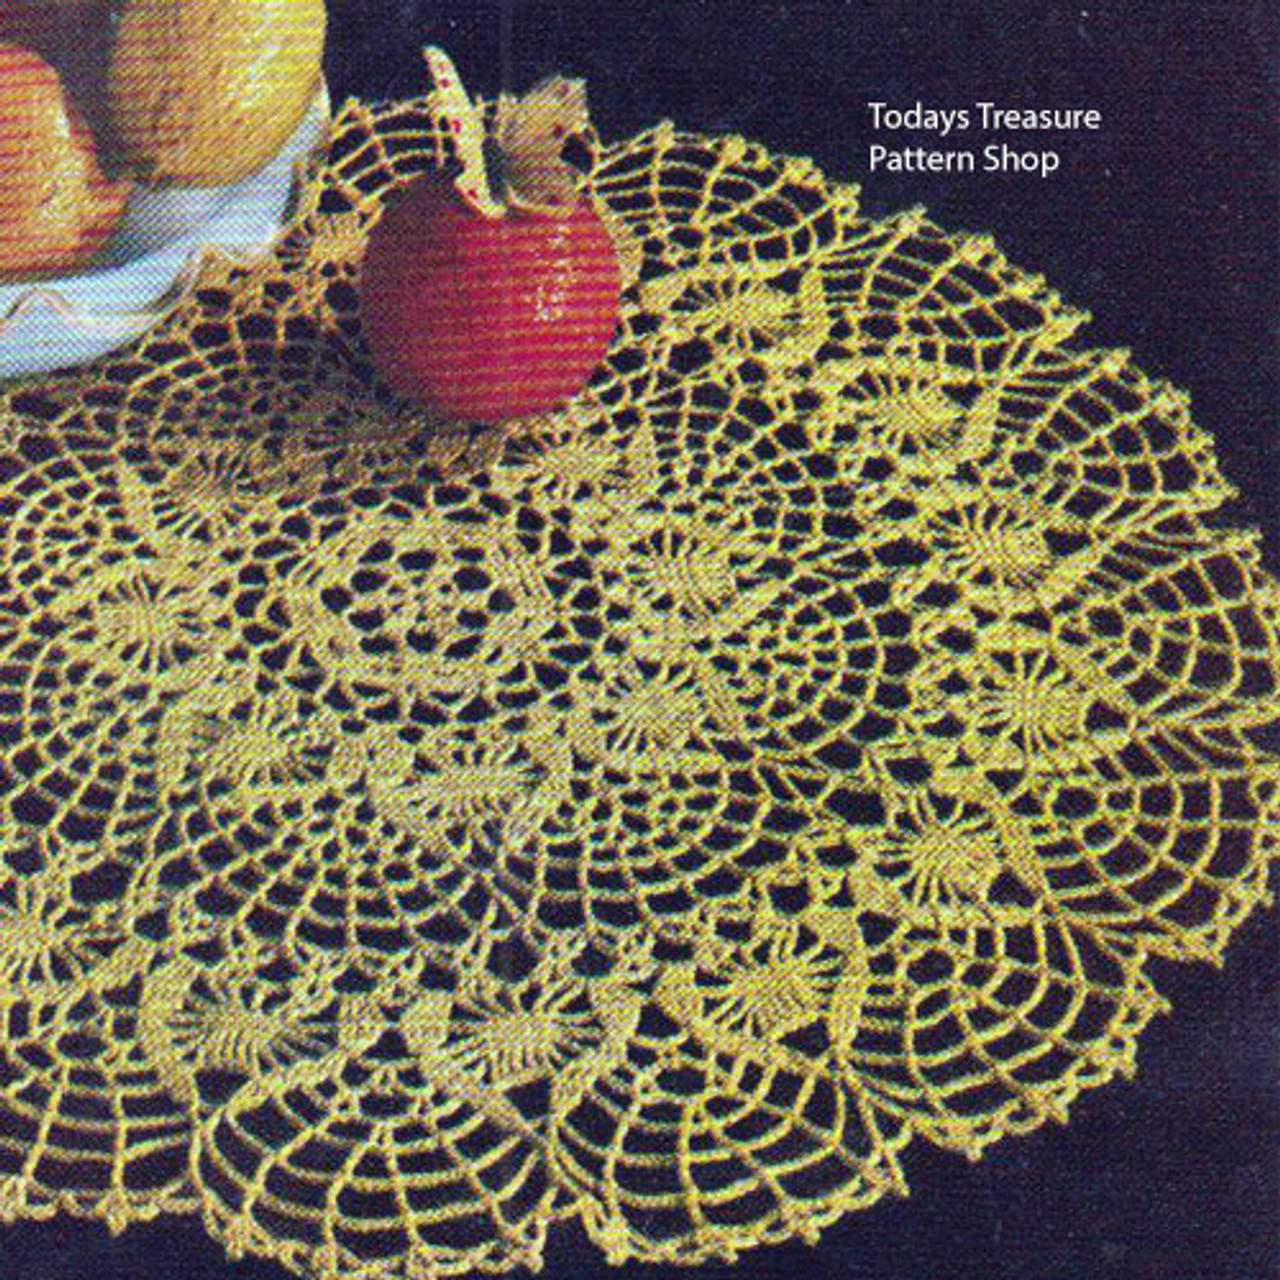 Crocheted Centerpiece Doily Pattern Golden Citrus